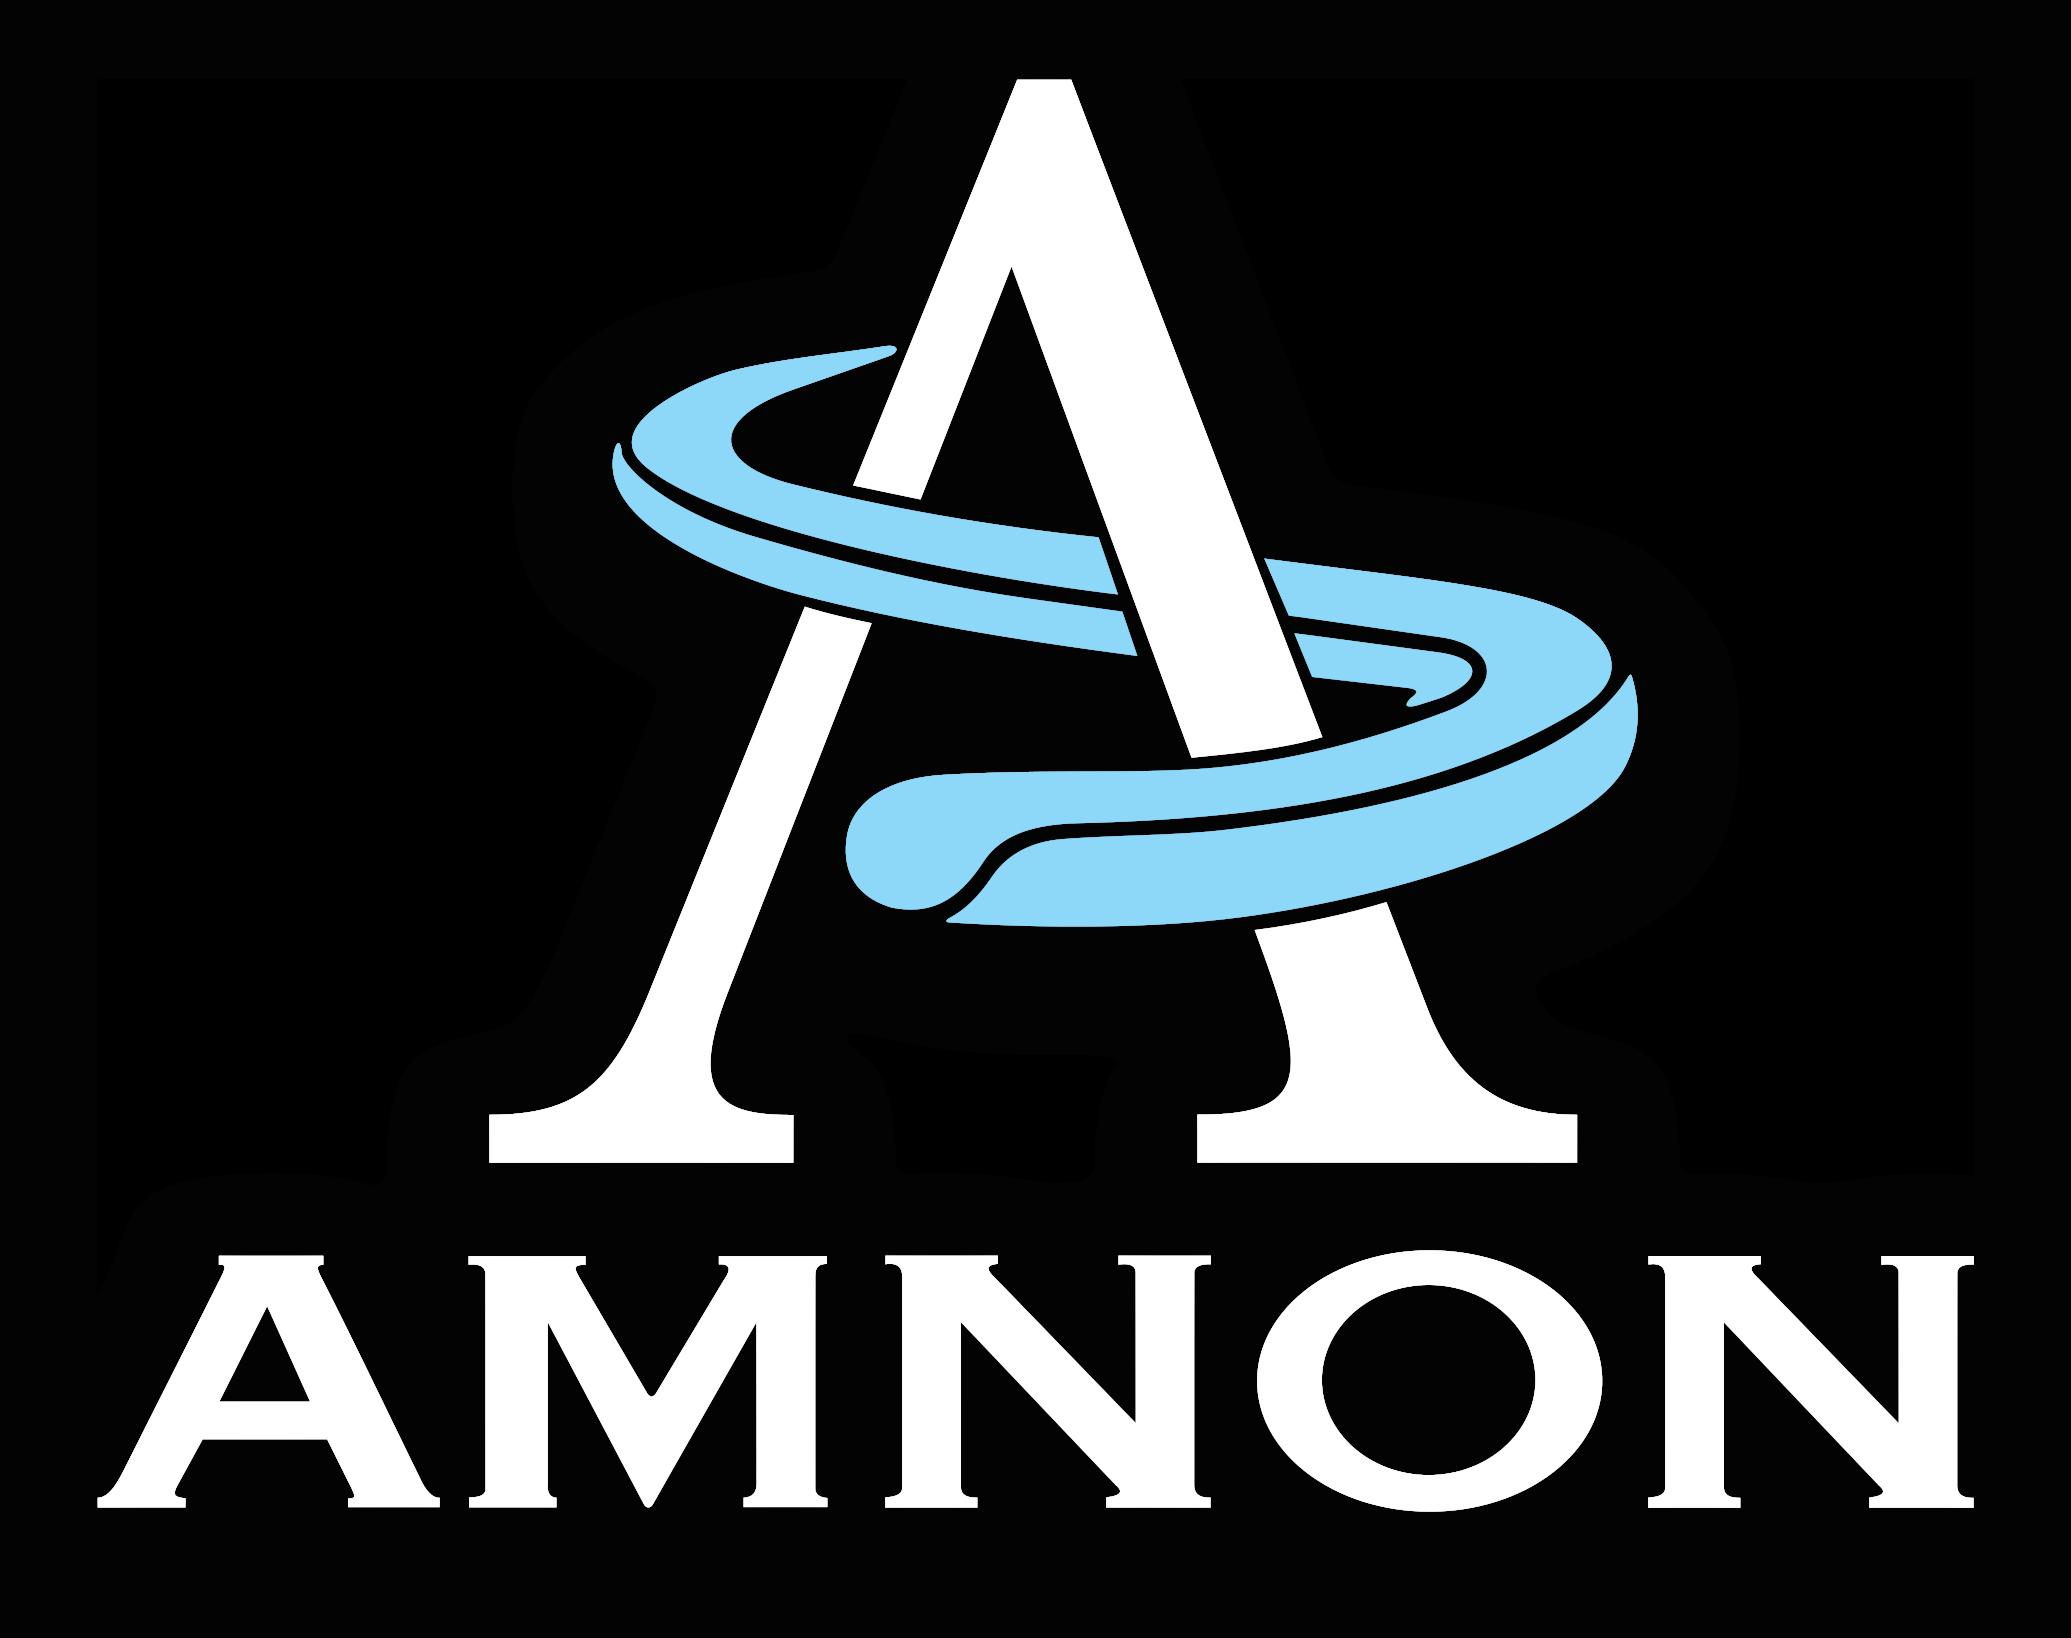 Amnon Polska